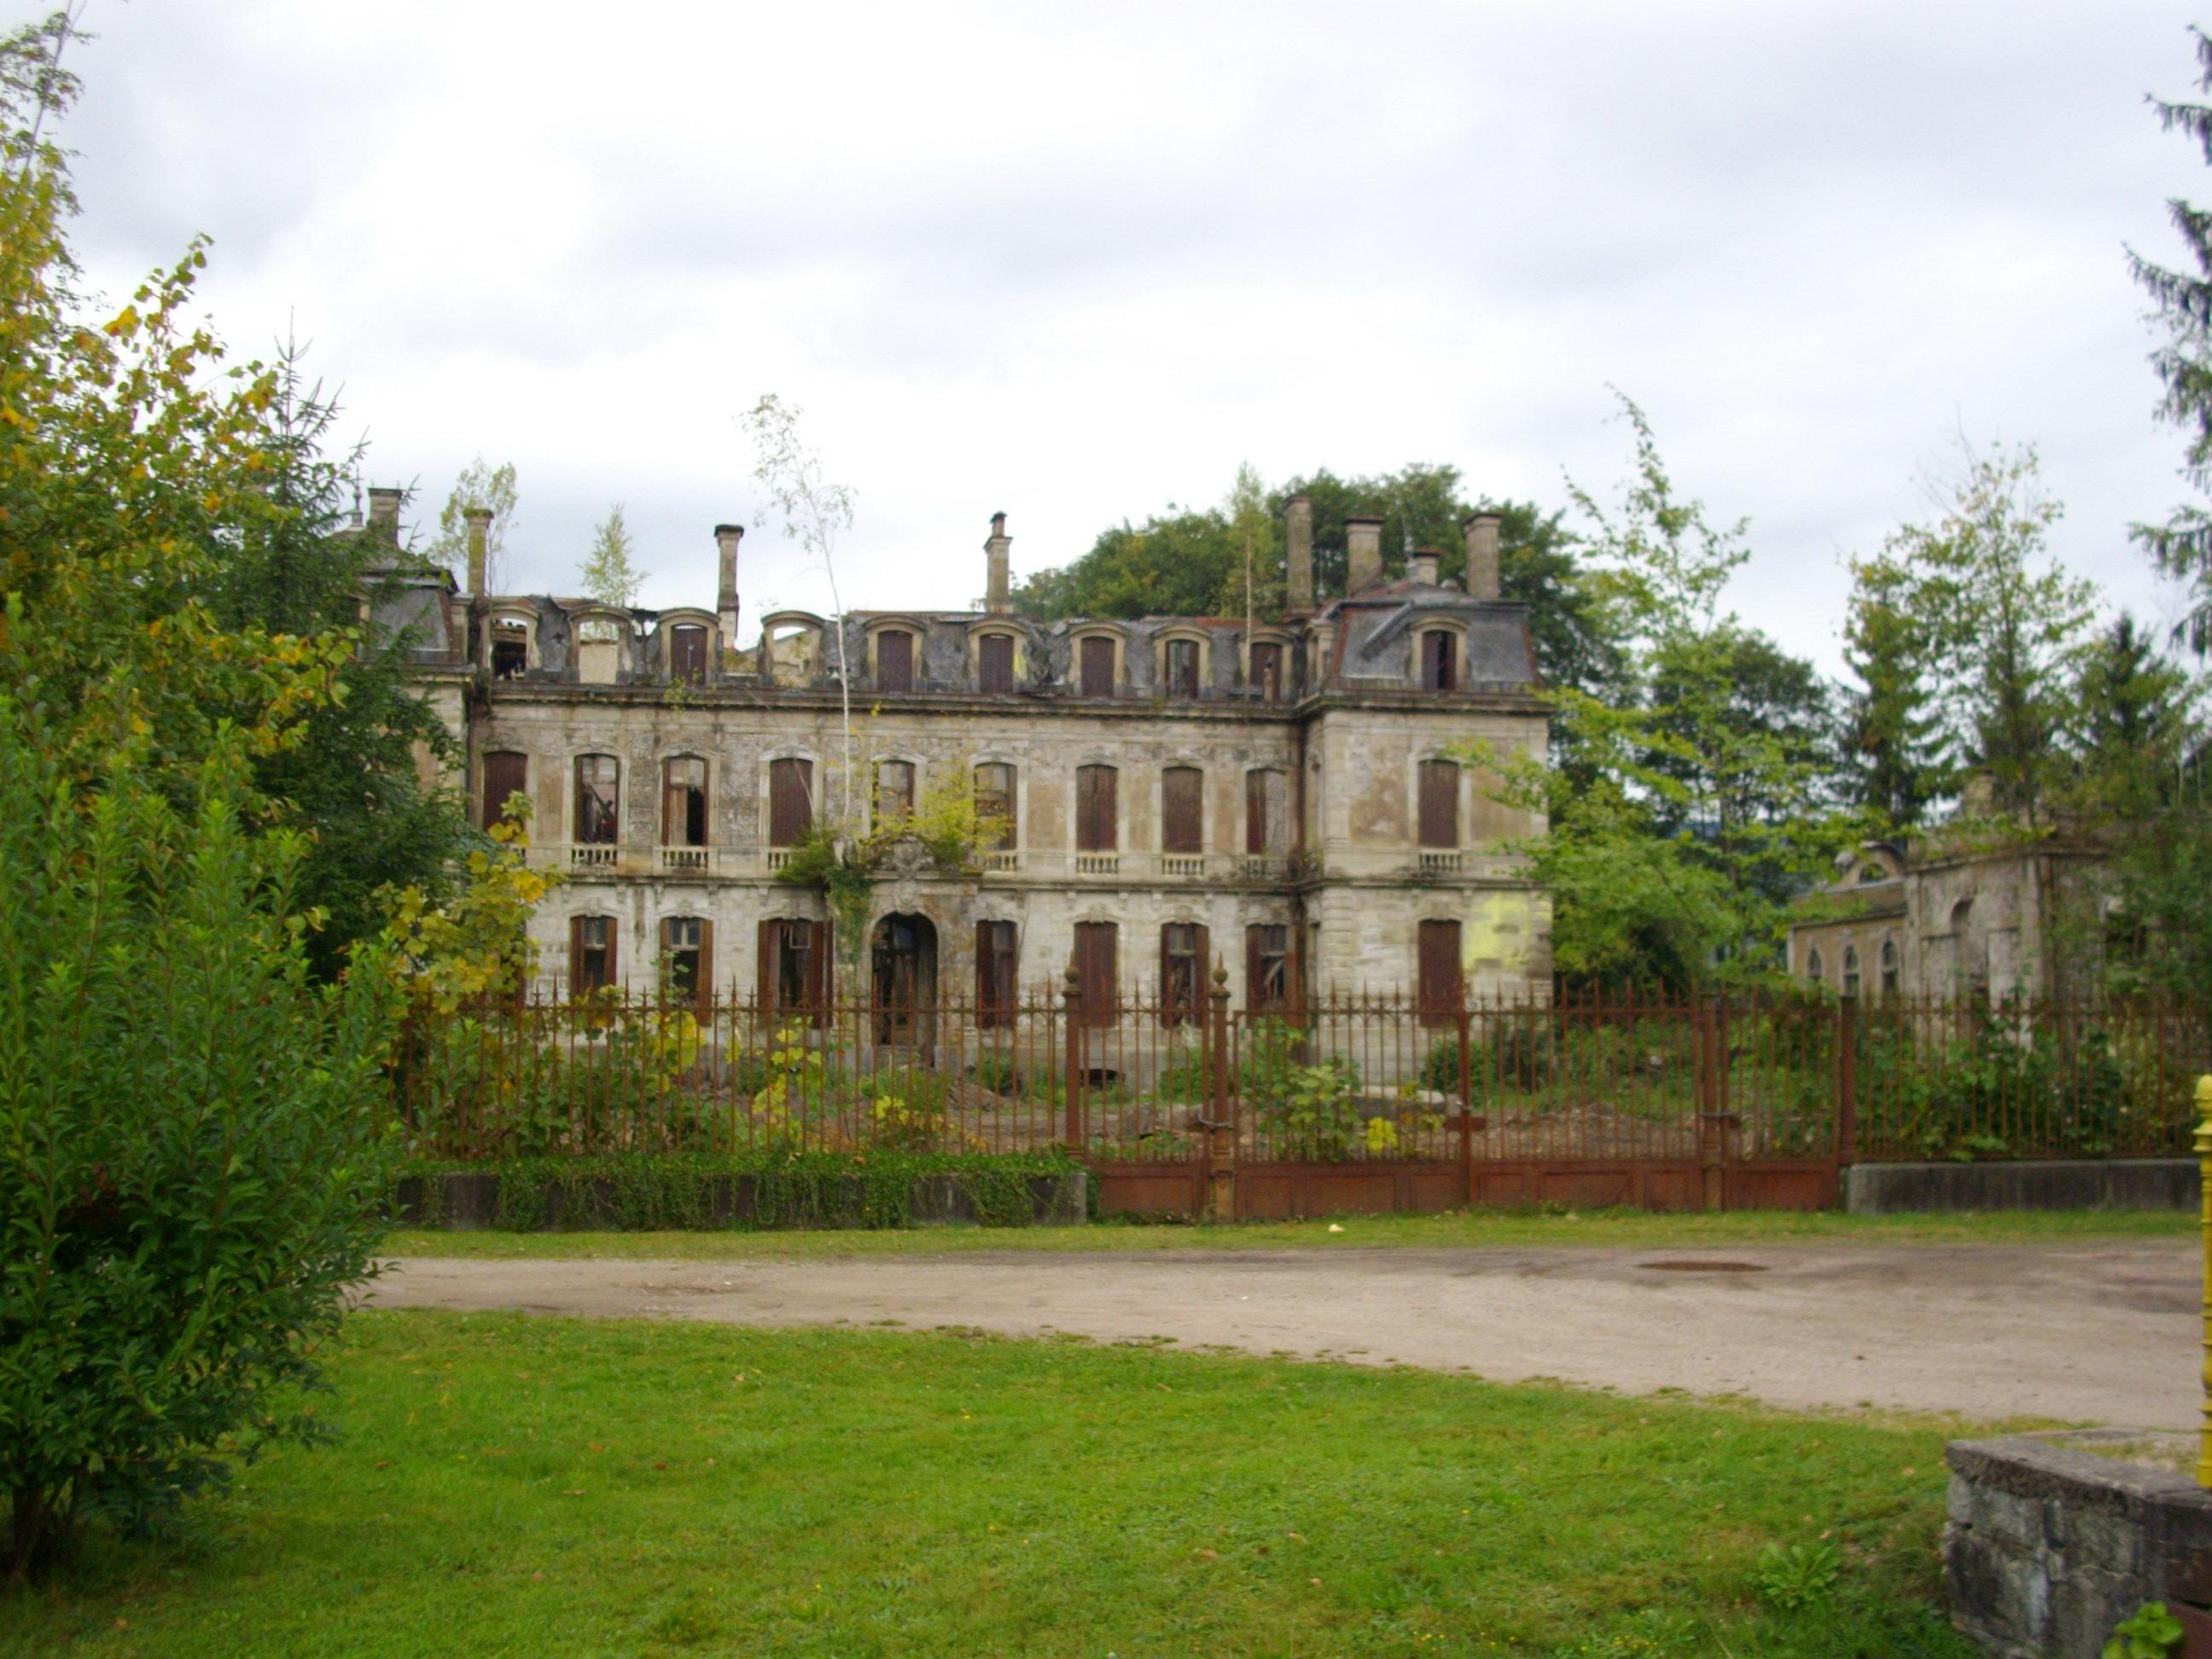 Hotel Pas Cher Remiremont